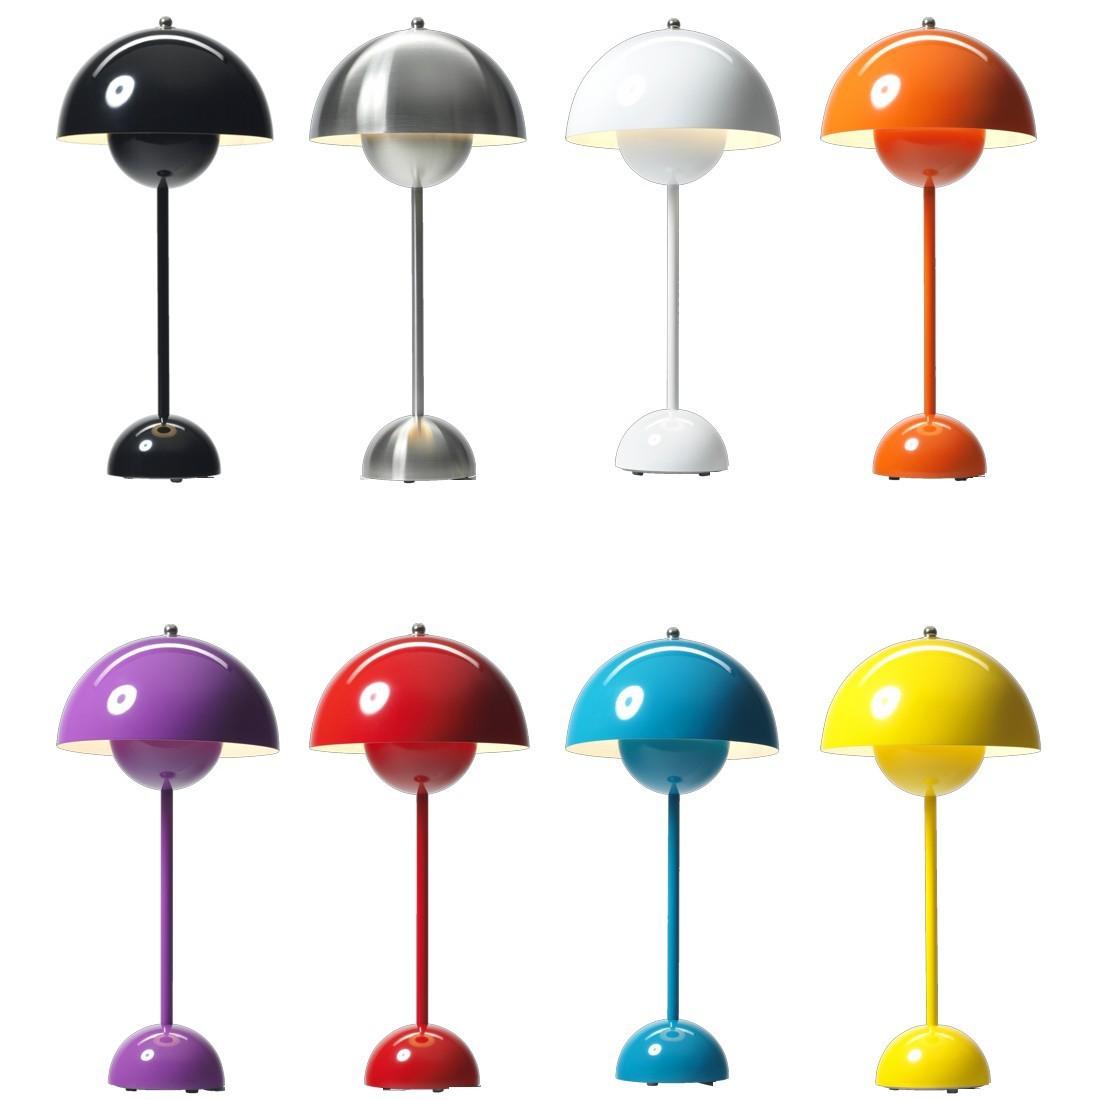 replica verner panton flowerpot 2 table lamp buy in online shop price order online. Black Bedroom Furniture Sets. Home Design Ideas